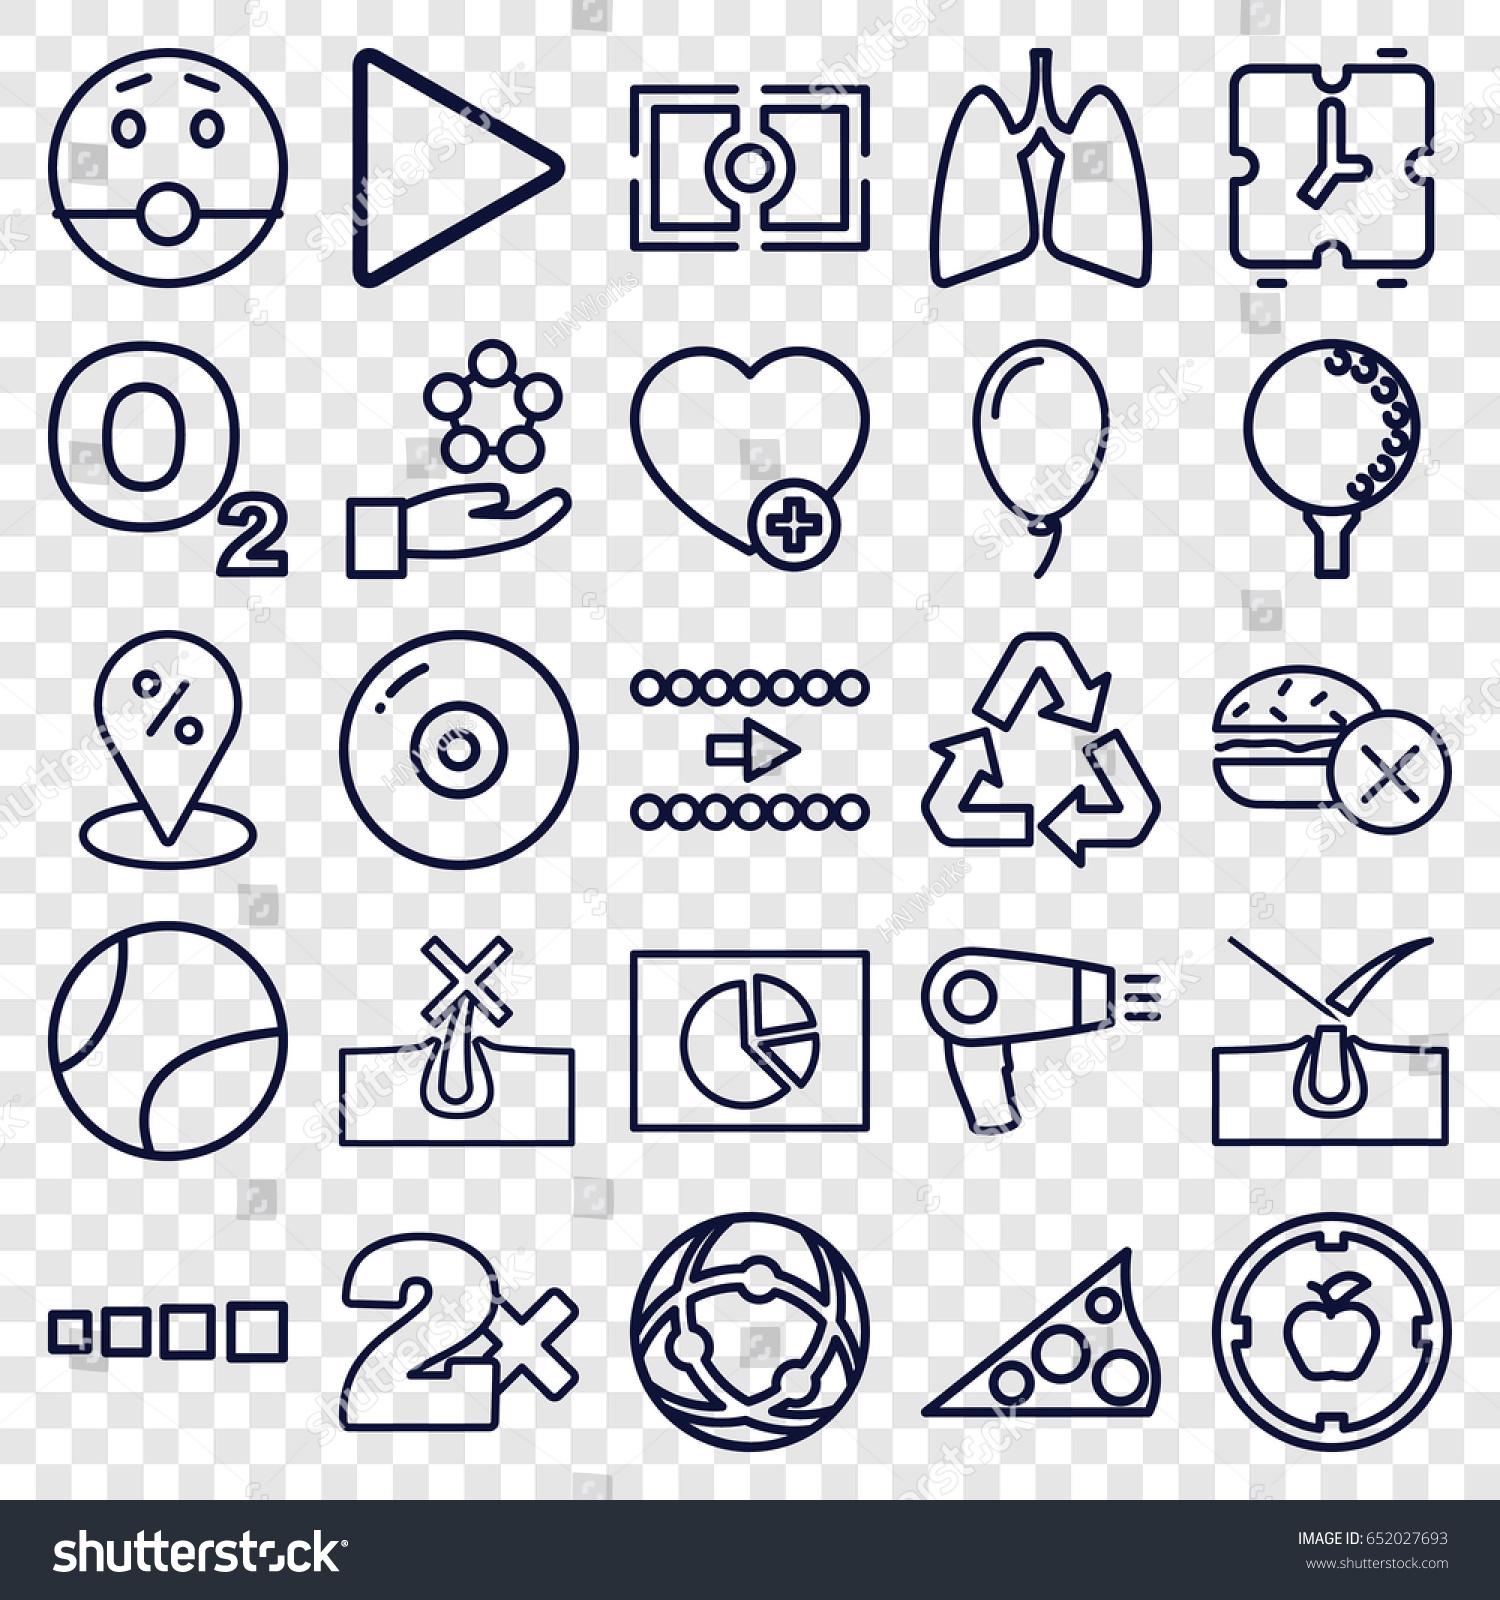 Circle icons set set 25 circle stock vector 652027693 shutterstock circle icons set set of 25 circle outline icons such as hair dryer no biocorpaavc Choice Image